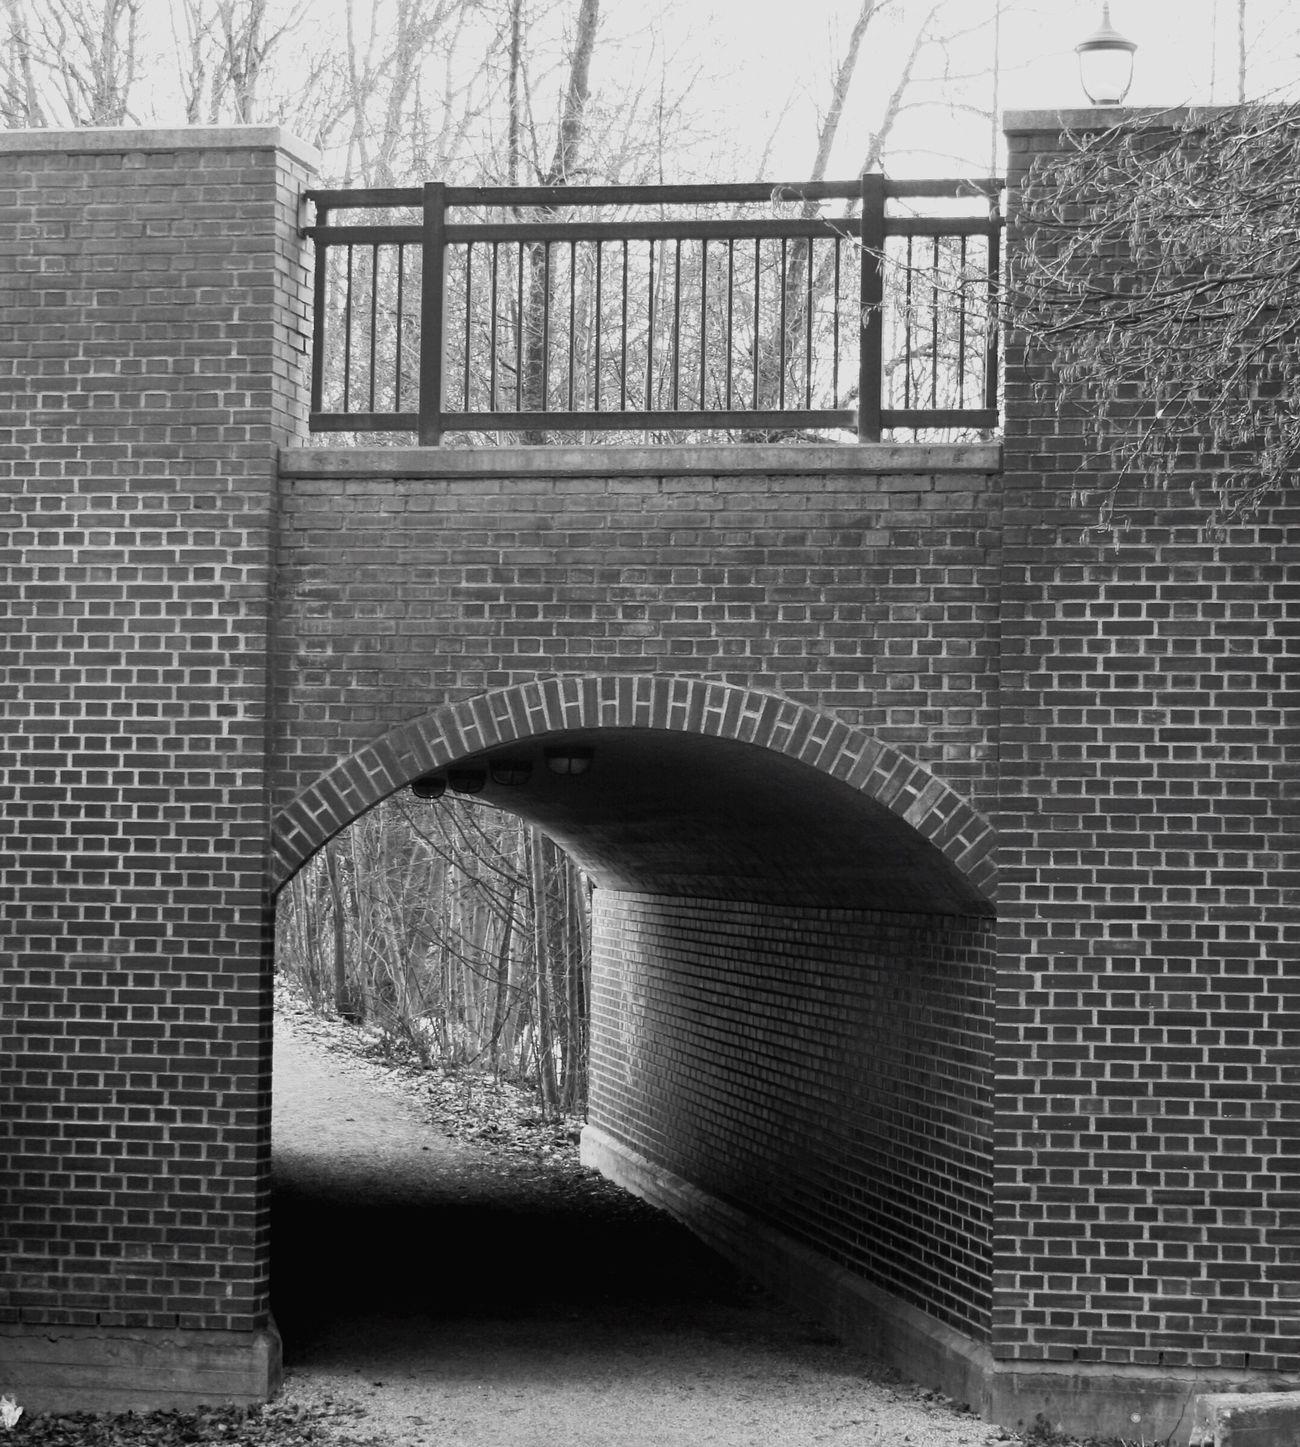 Bridge Oldbridge Bricks Brick Building Brickporn Oslo EyeEm No People Beautyinordinarythings Stone Material